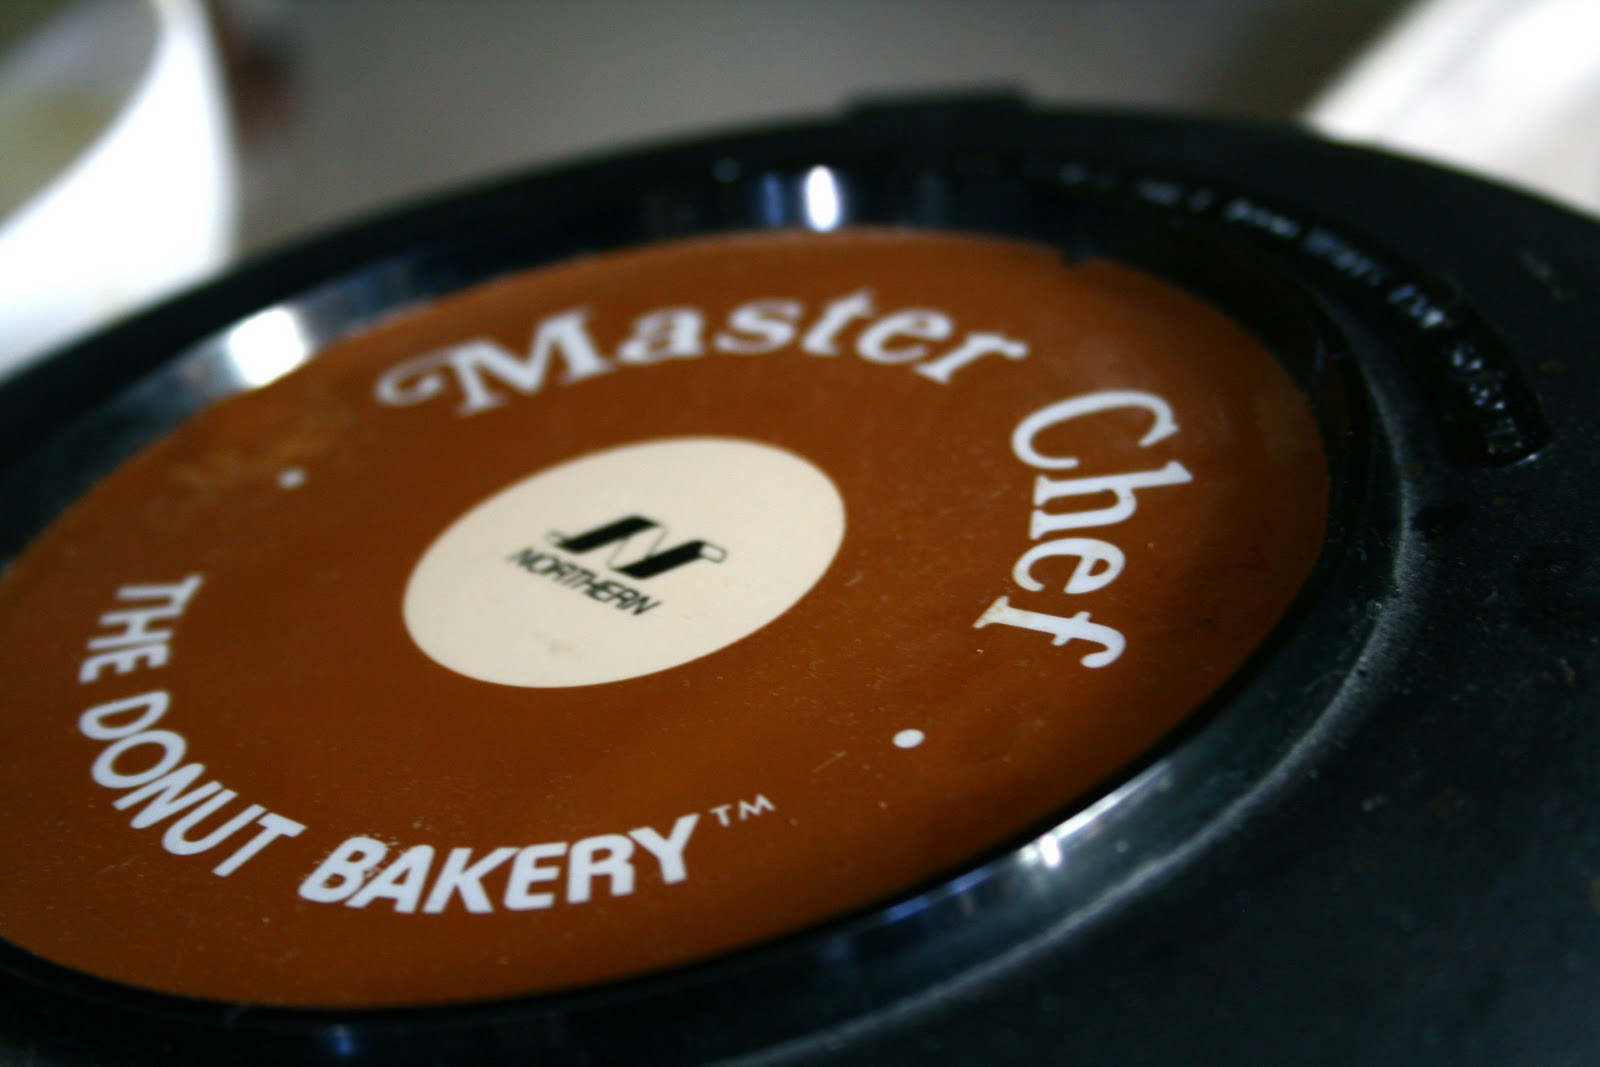 Doughnut maker gluten free doughnuts